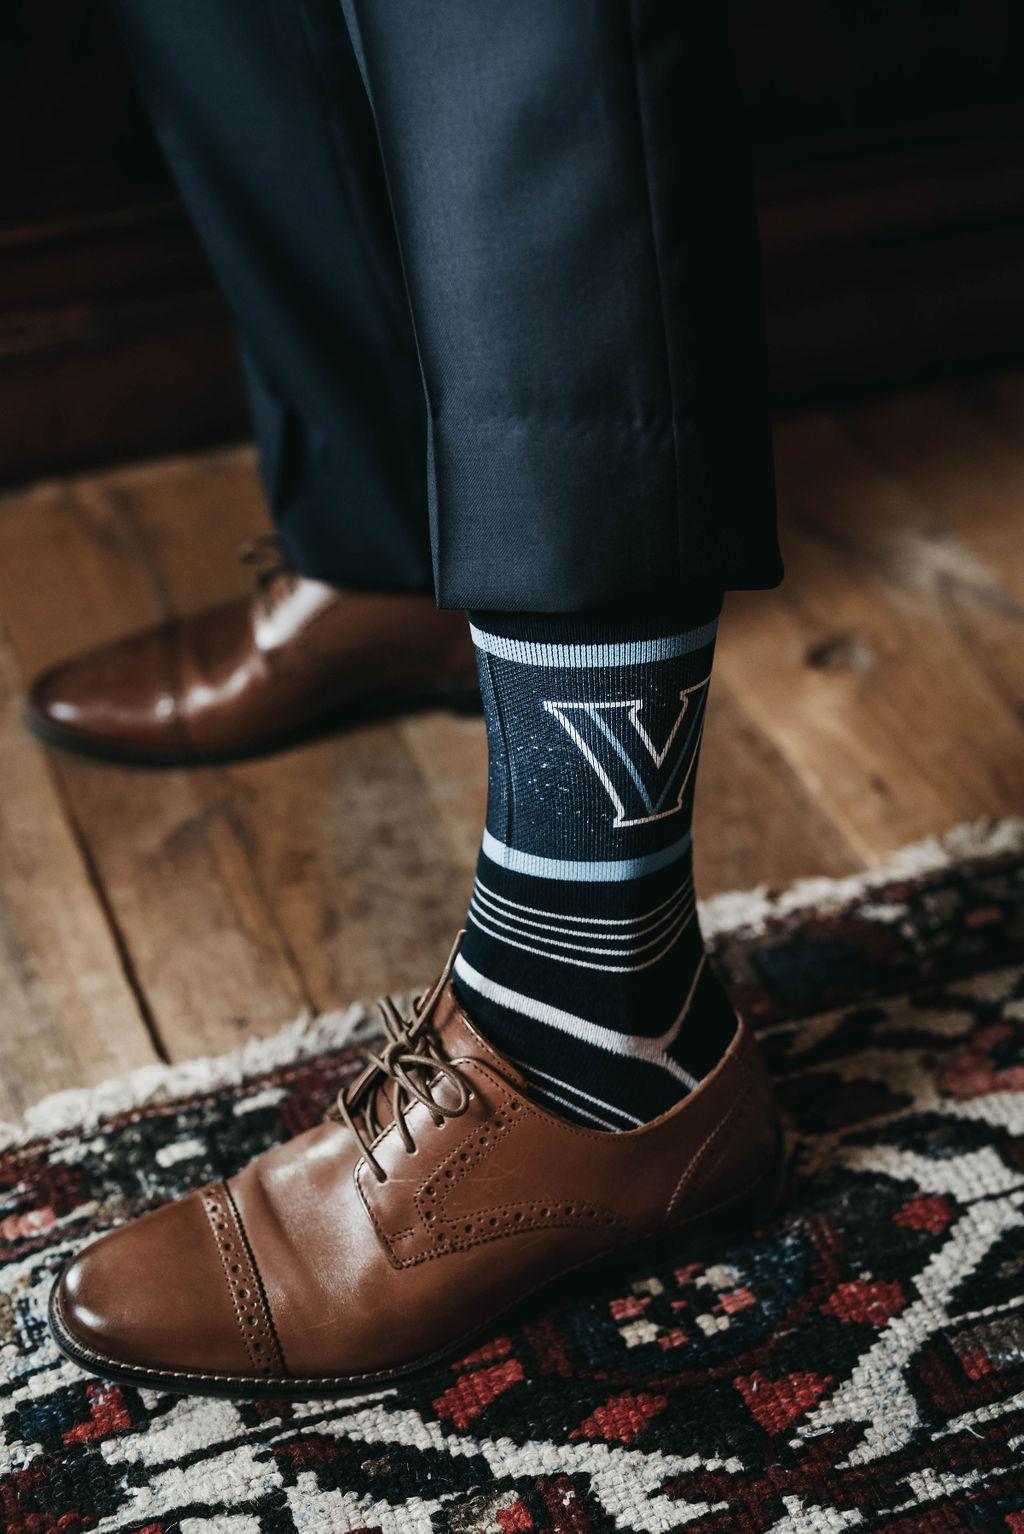 Groom's wedding day socks